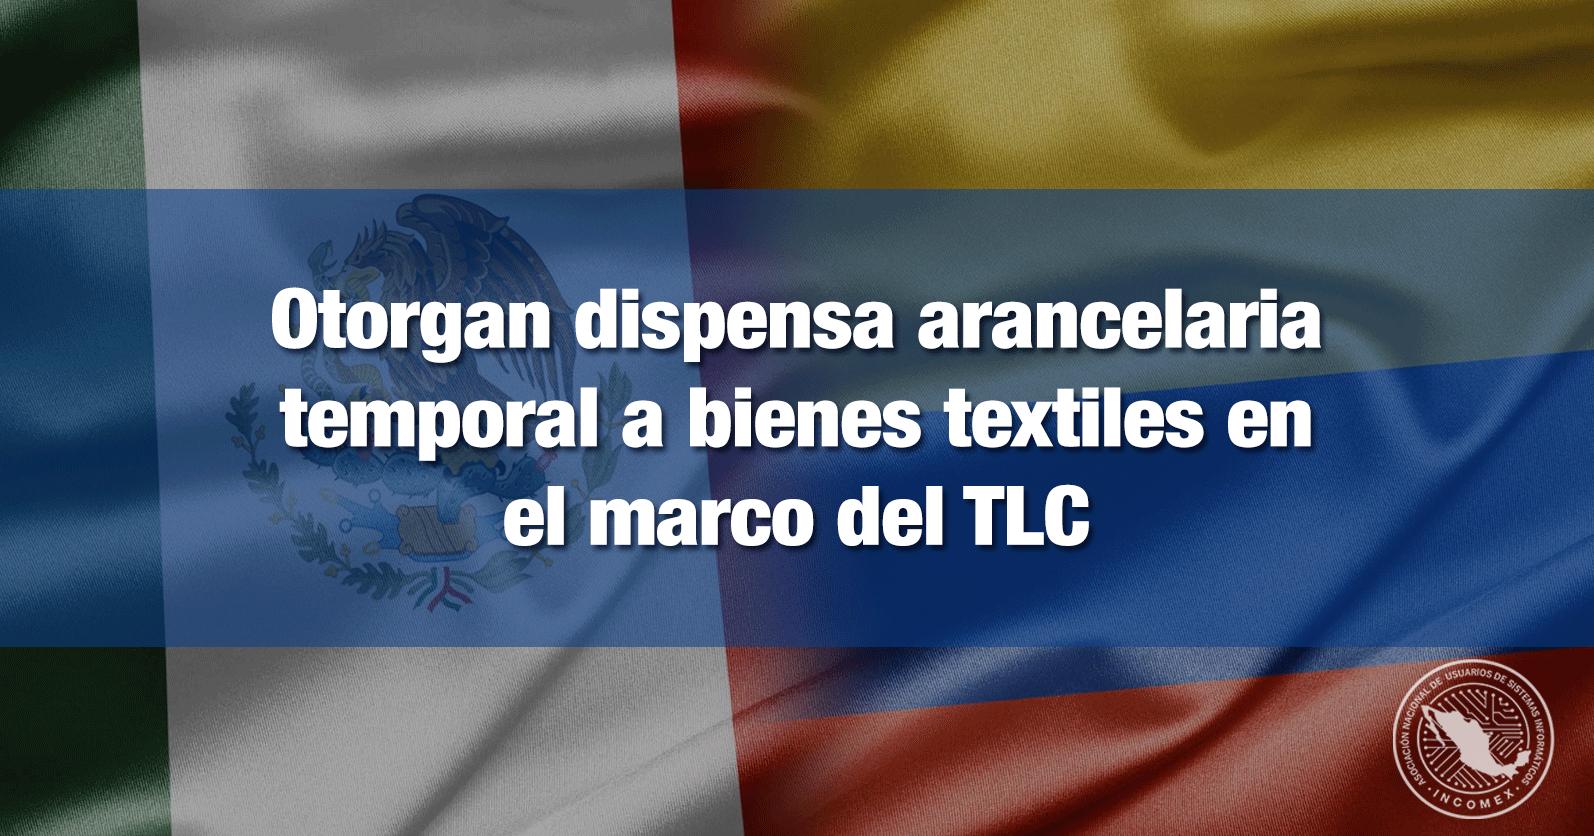 Otorgan dispensa arancelaria temporal a bienes textiles en el marco del TLC México-Colombia